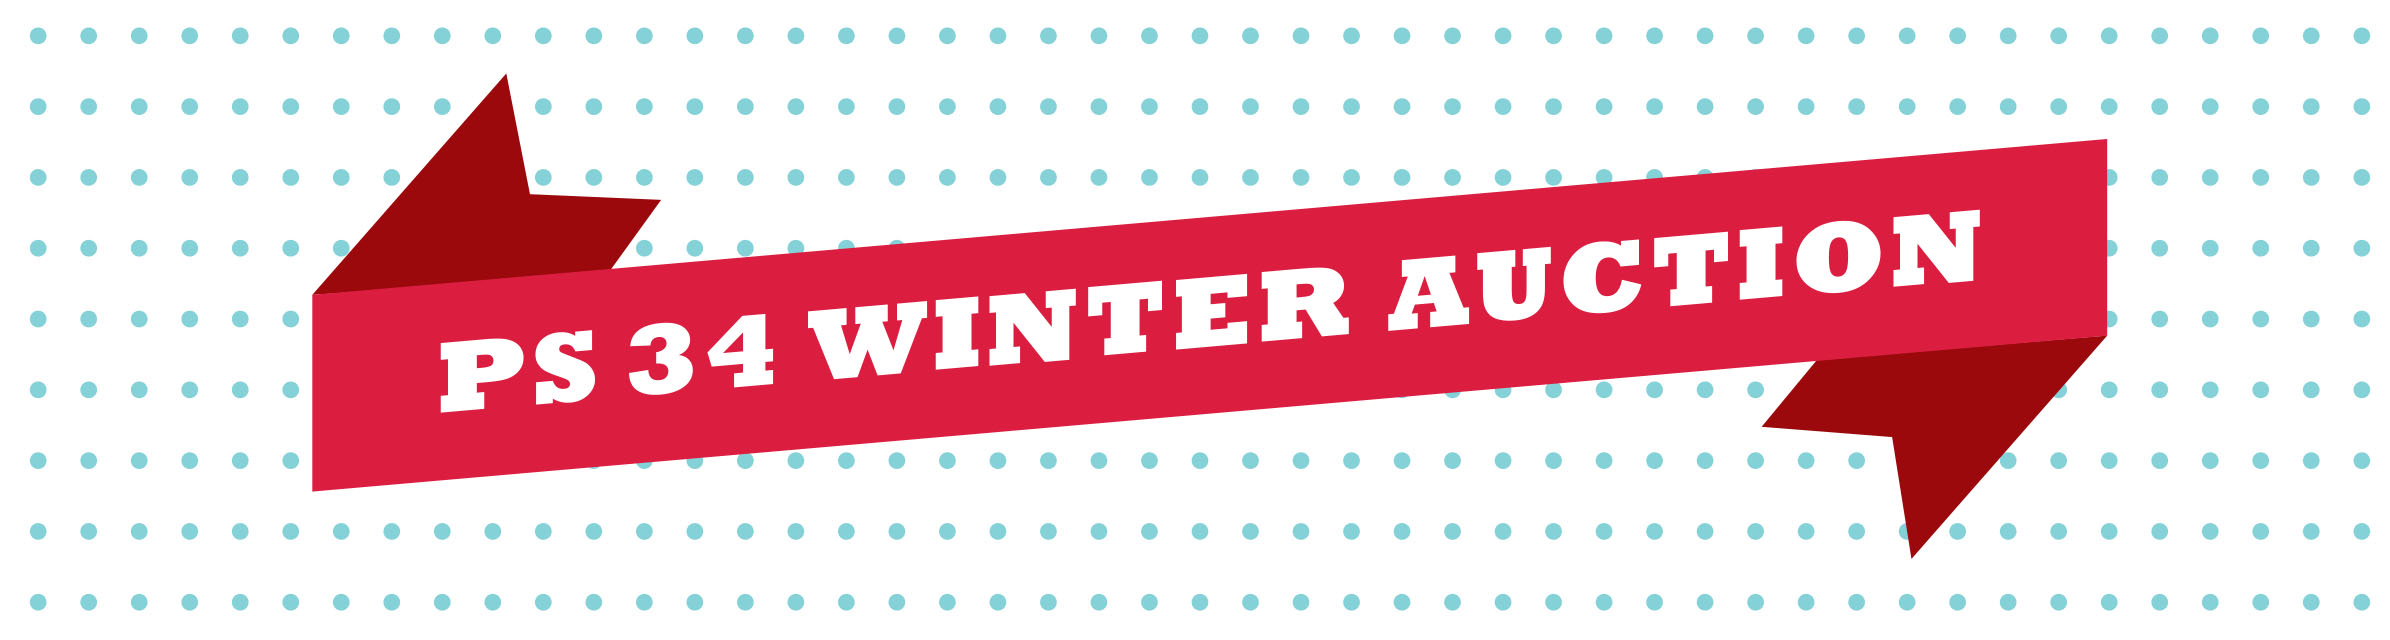 PS34_Winter_Auction.jpg